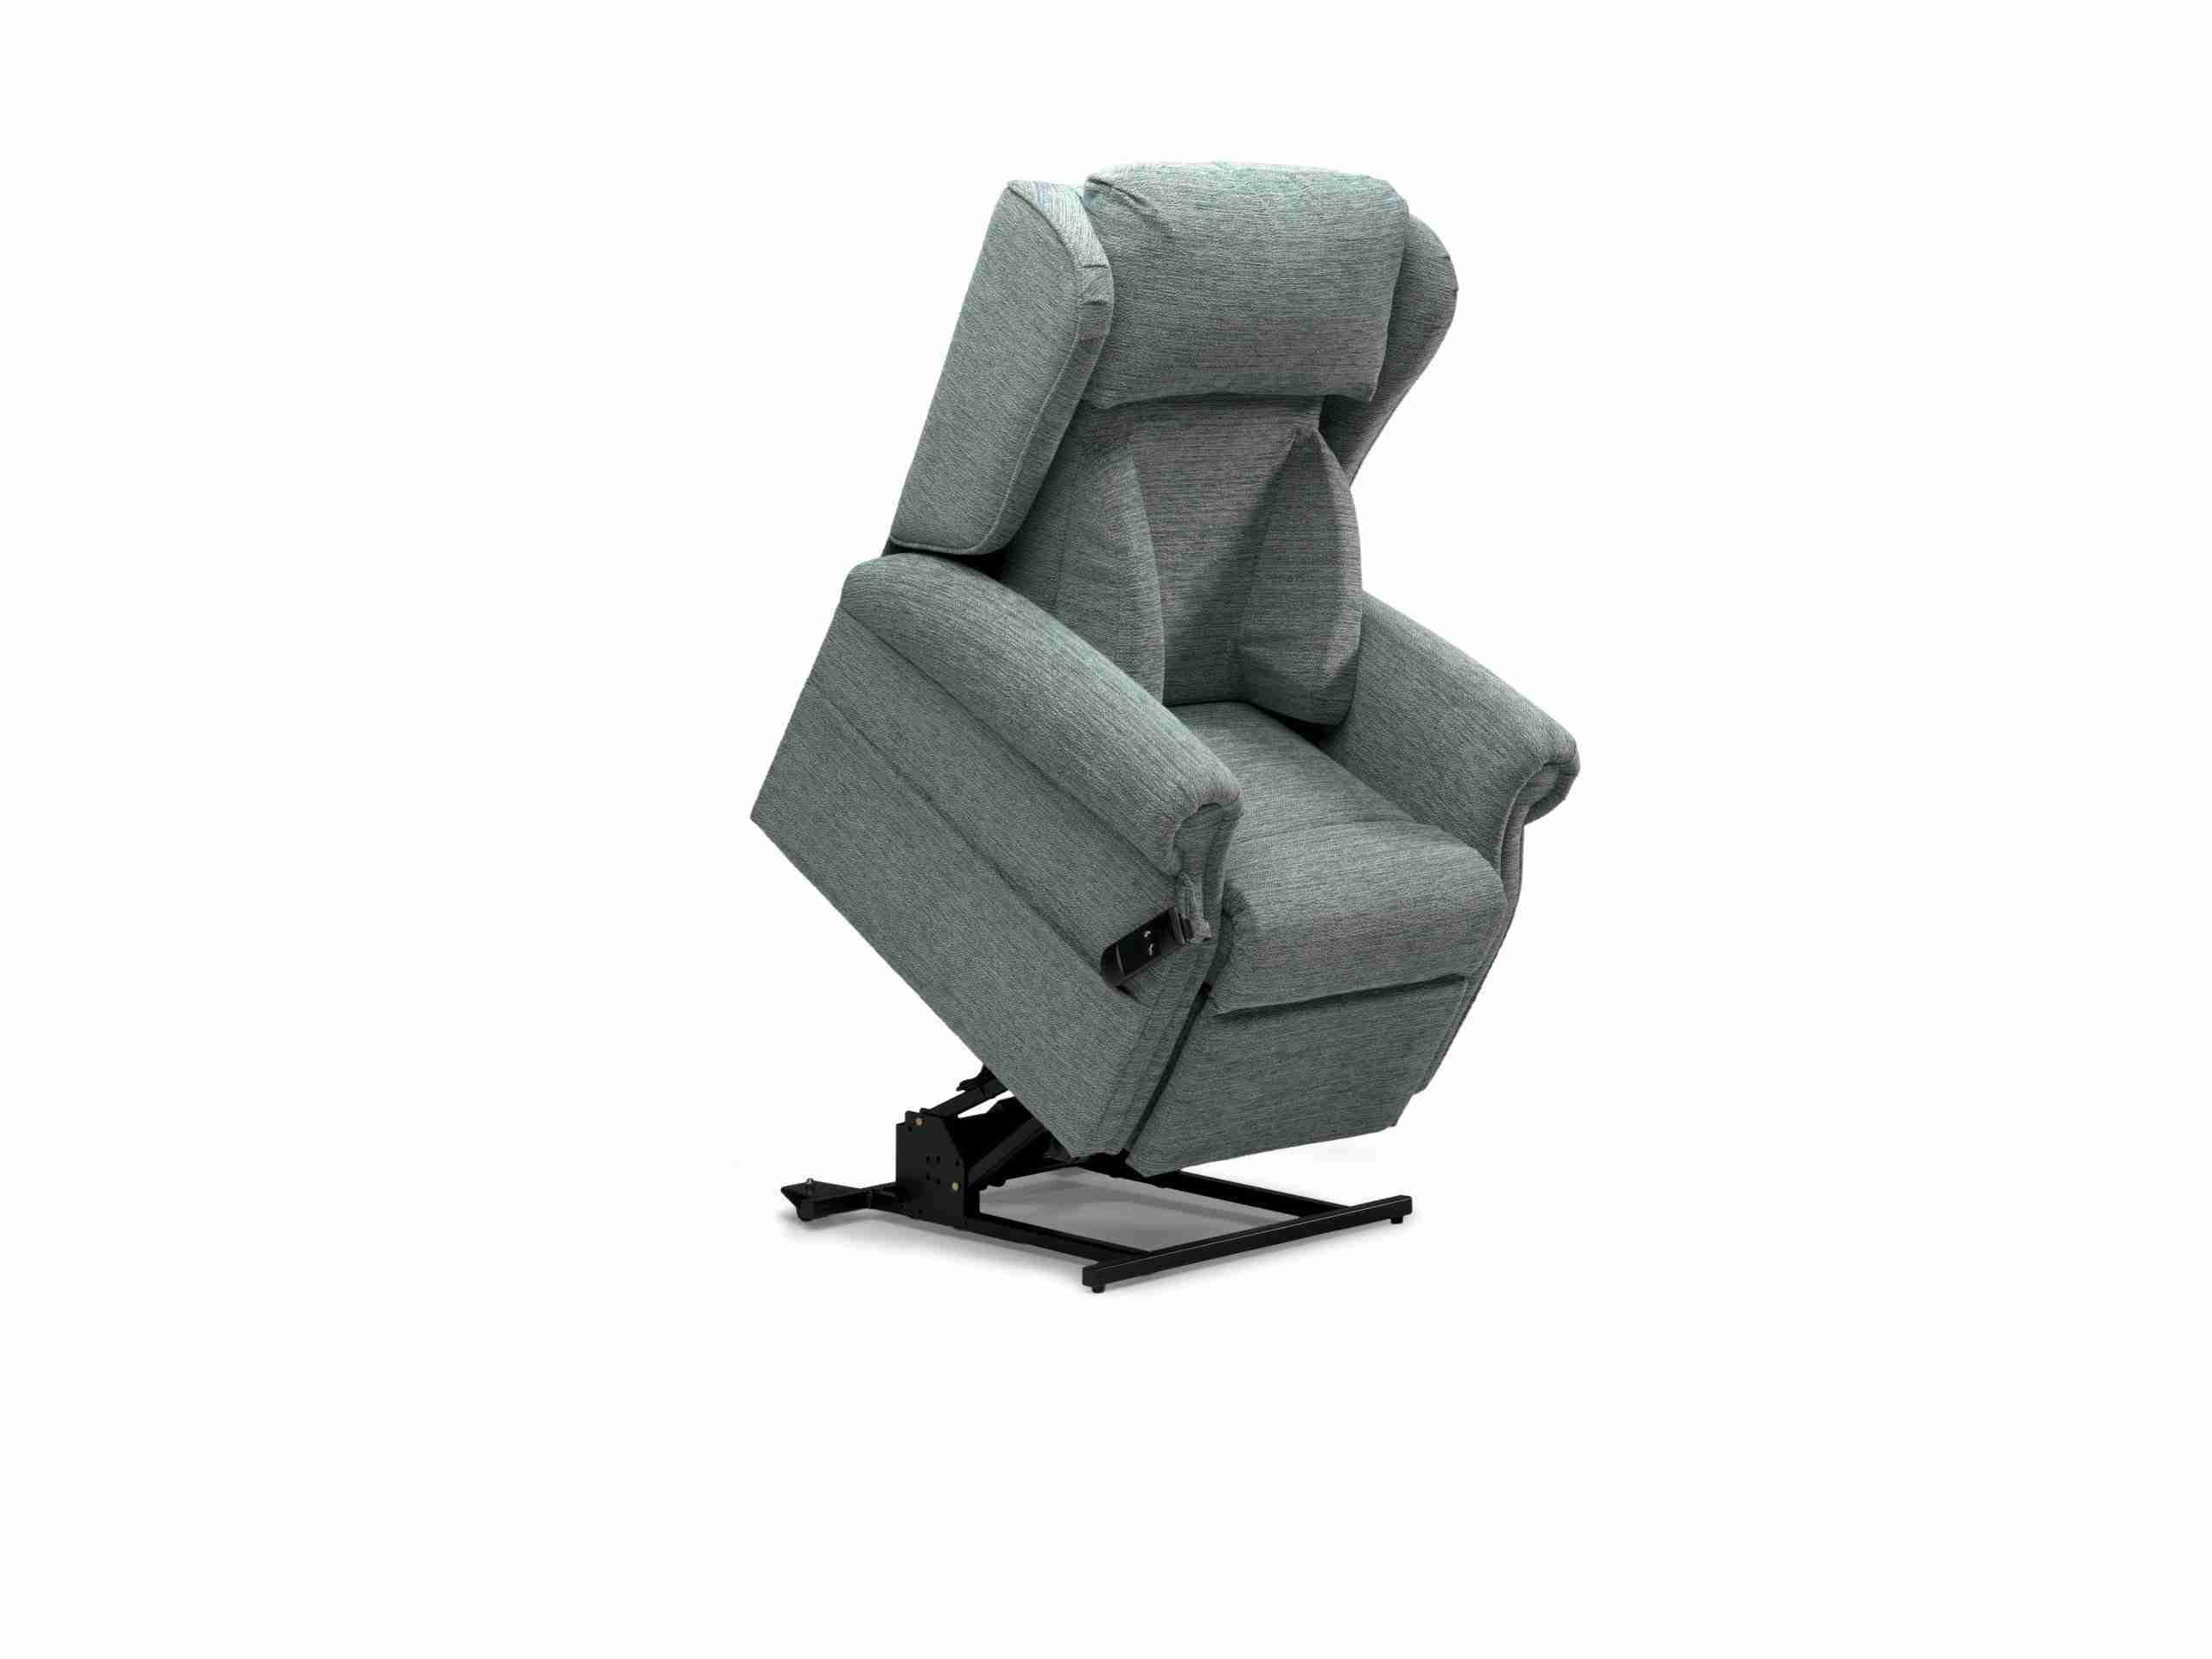 Chatsworth Chair Repose005